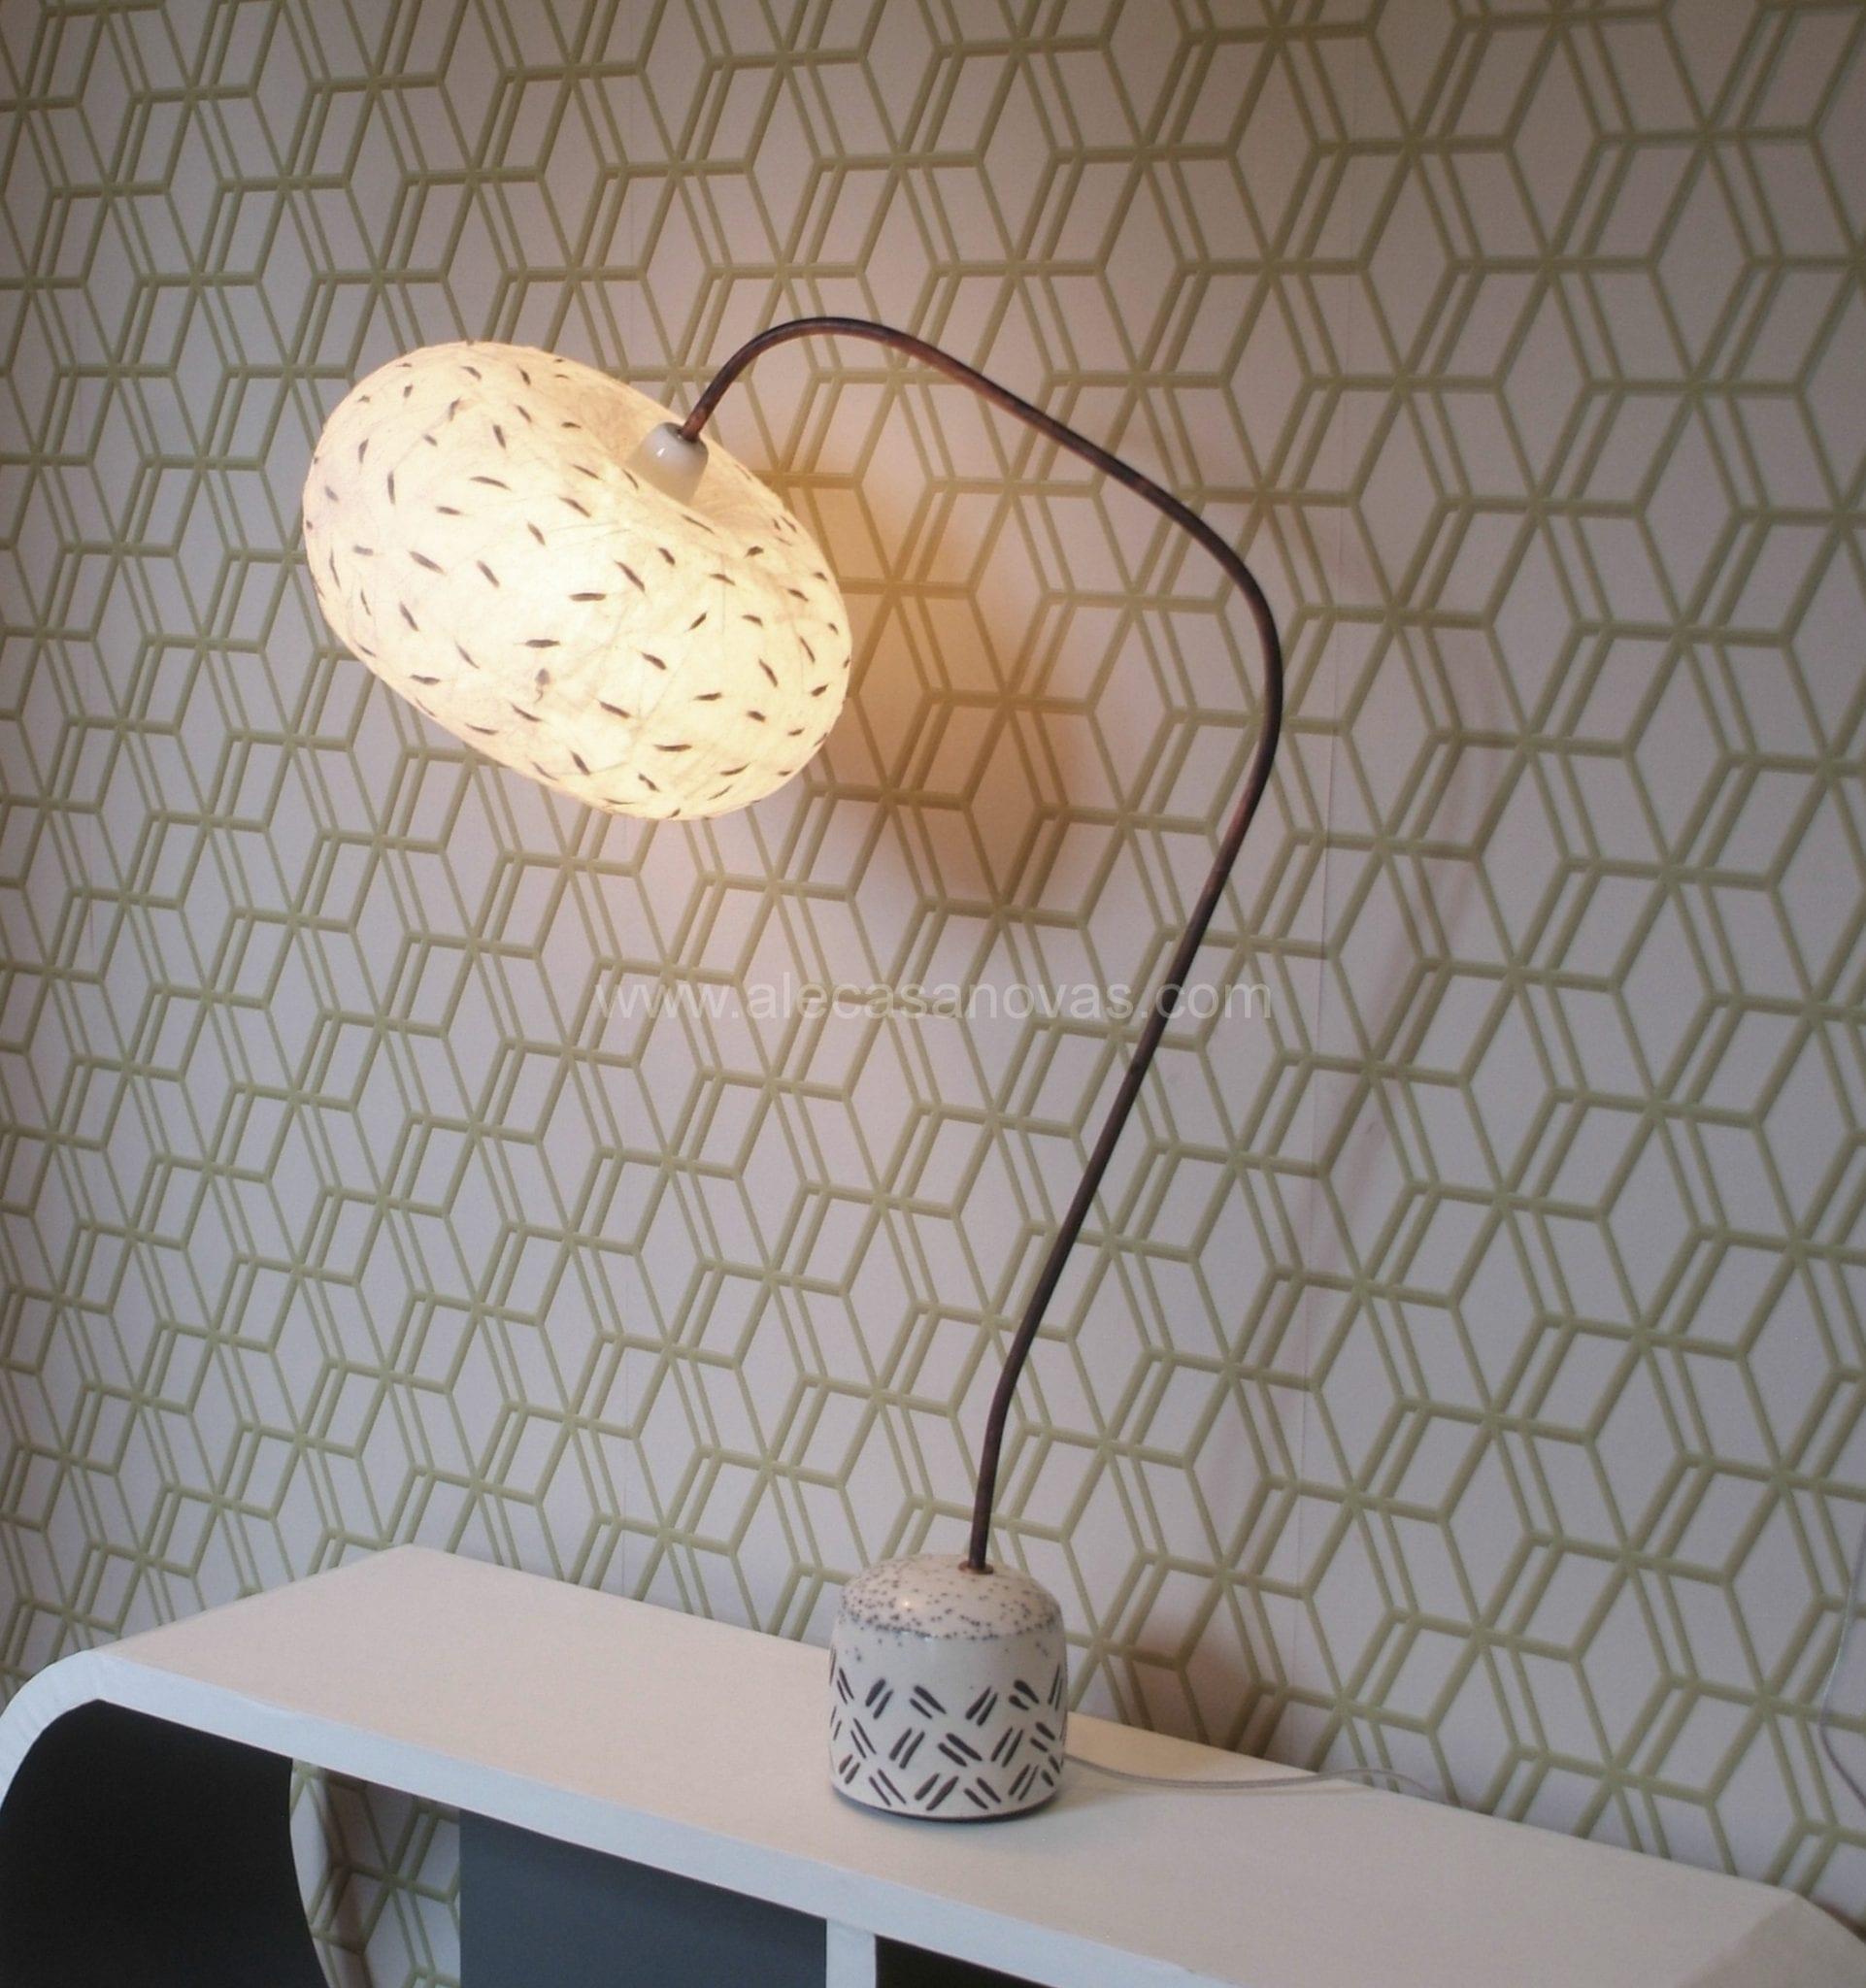 lampe-raku-papier-blanche-gd